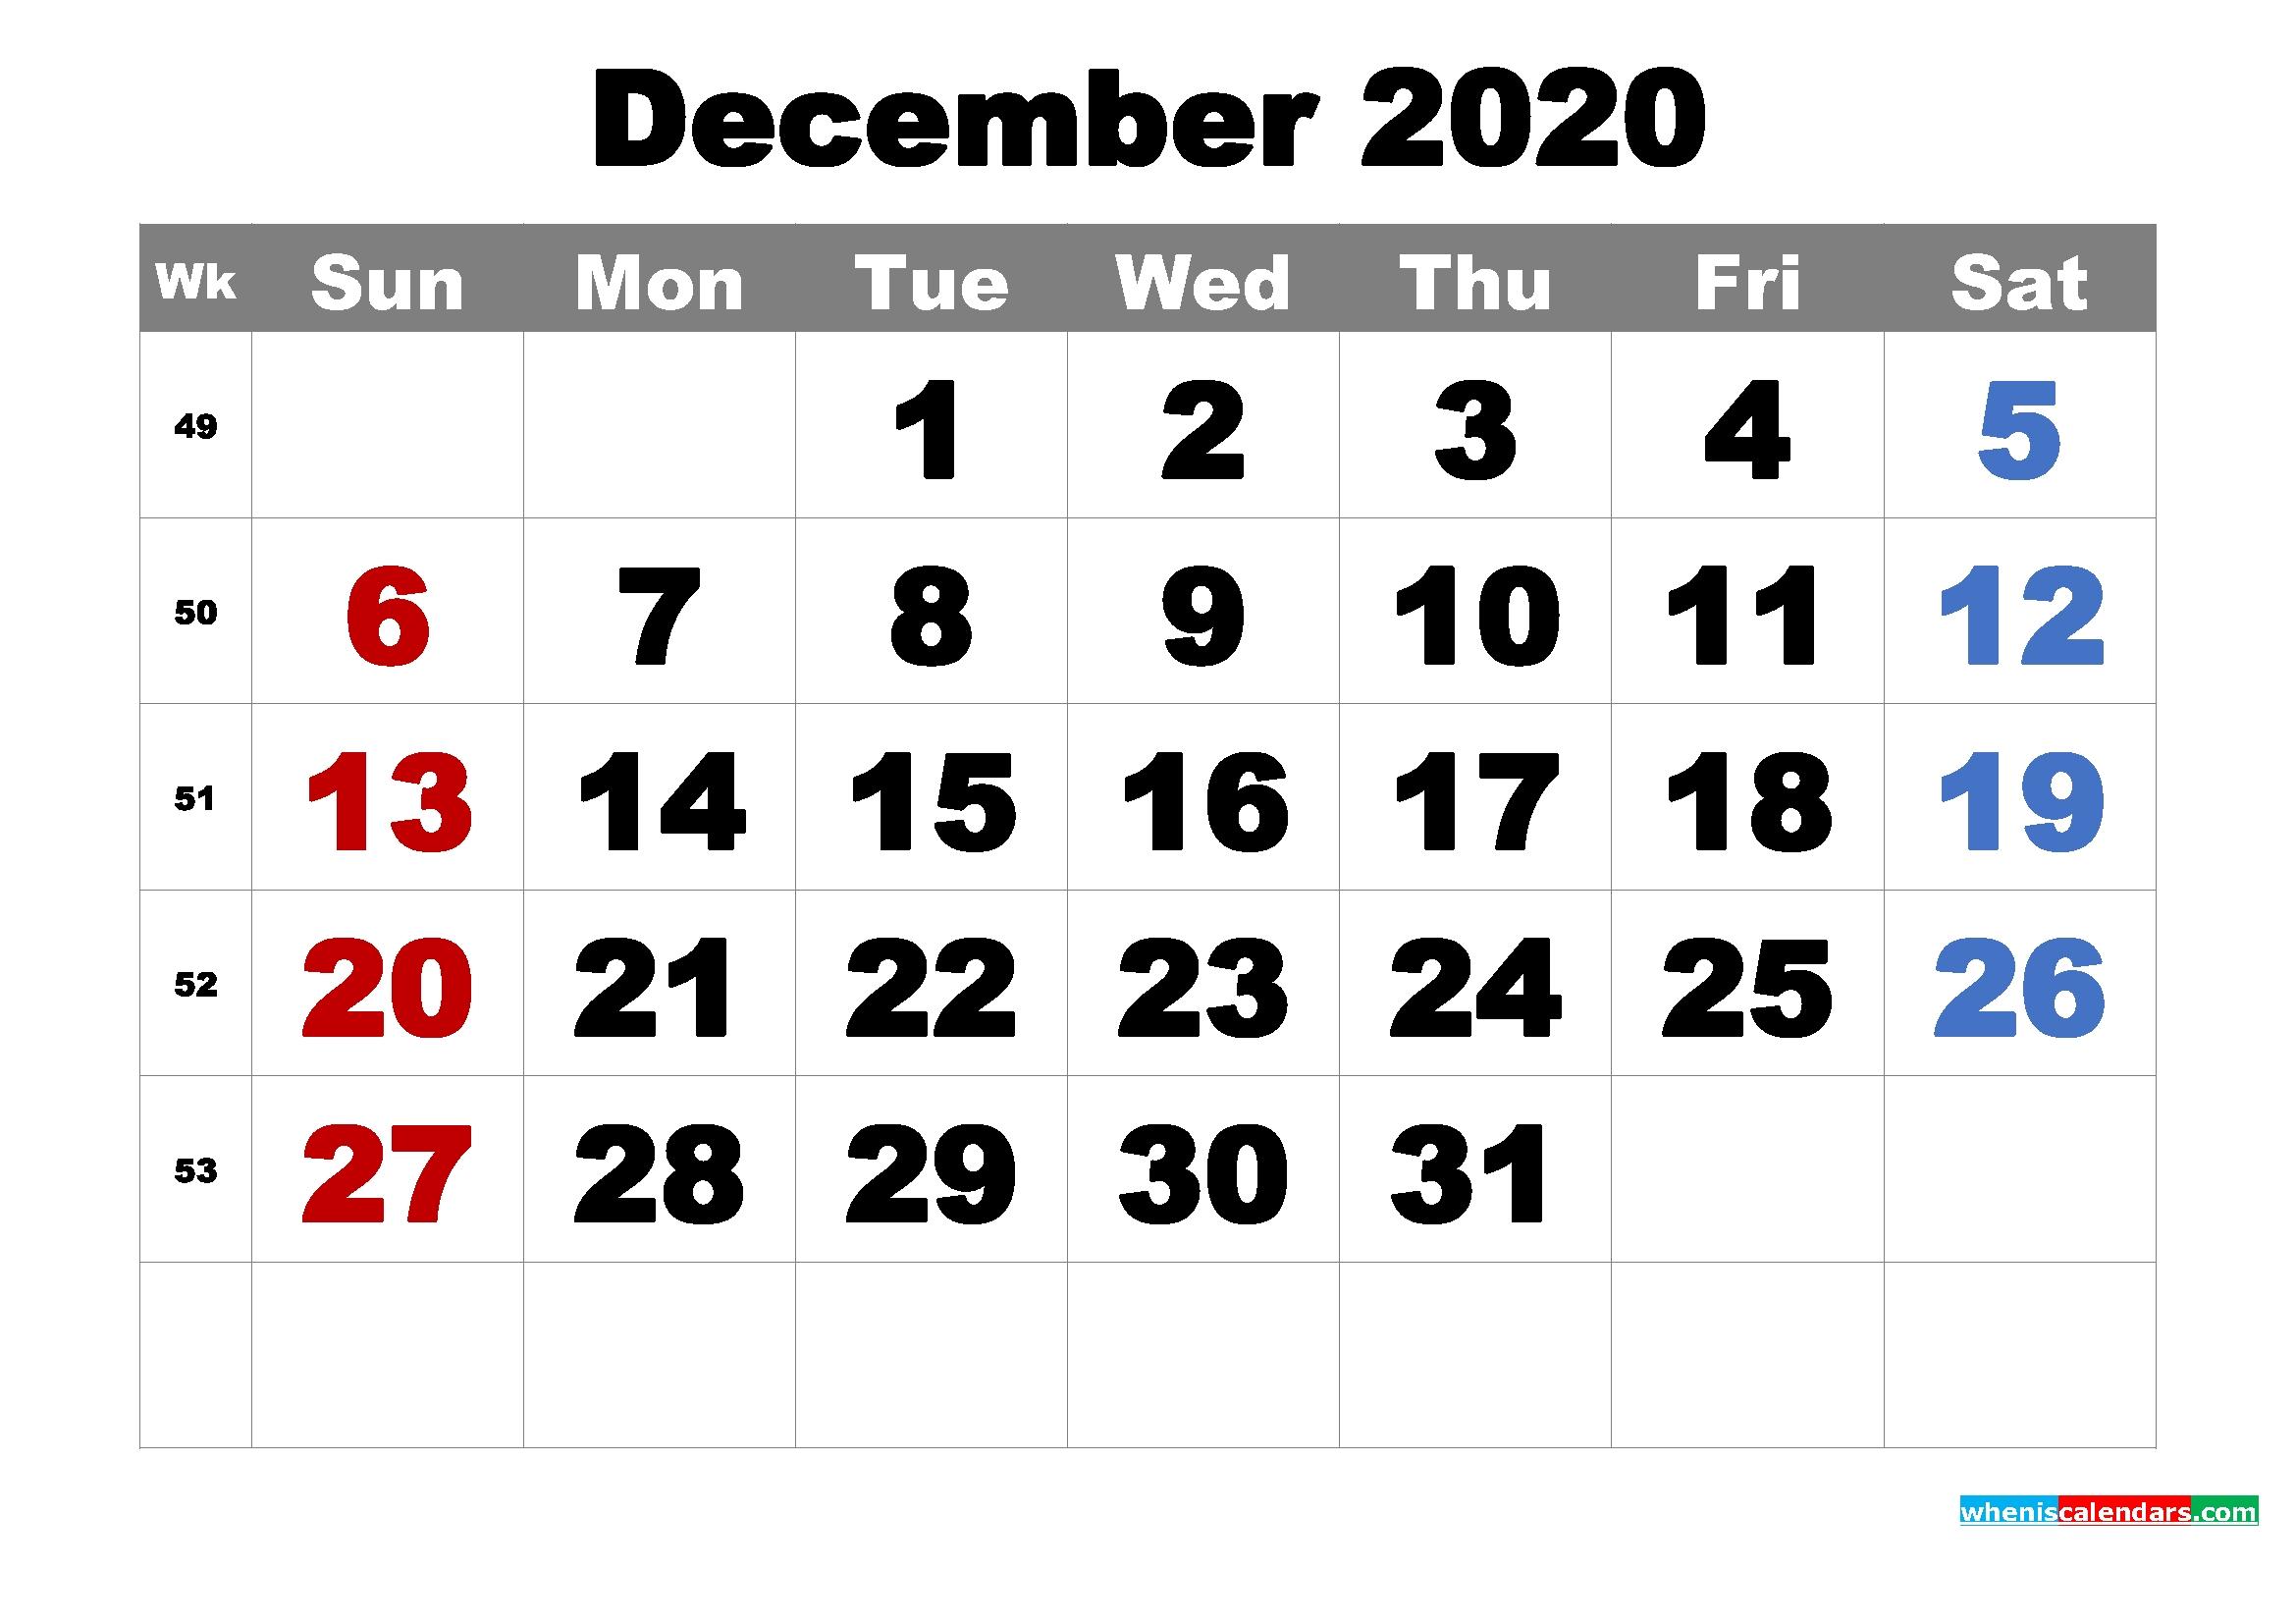 Free Printable December 2020 Calendar Word, Pdf, Image